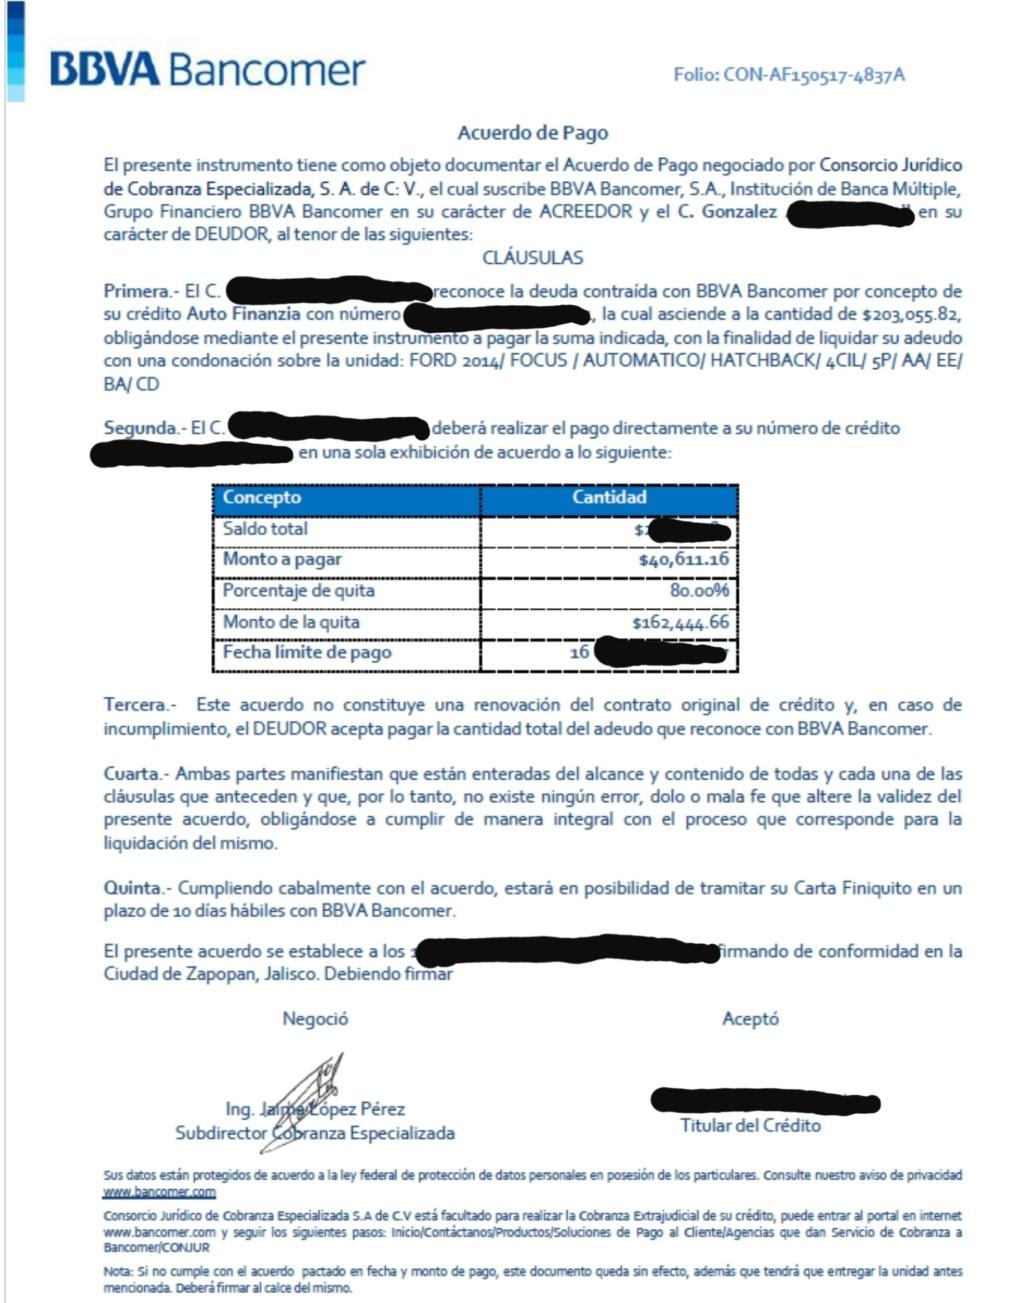 Carta convenio Bancomer Djdjjd12